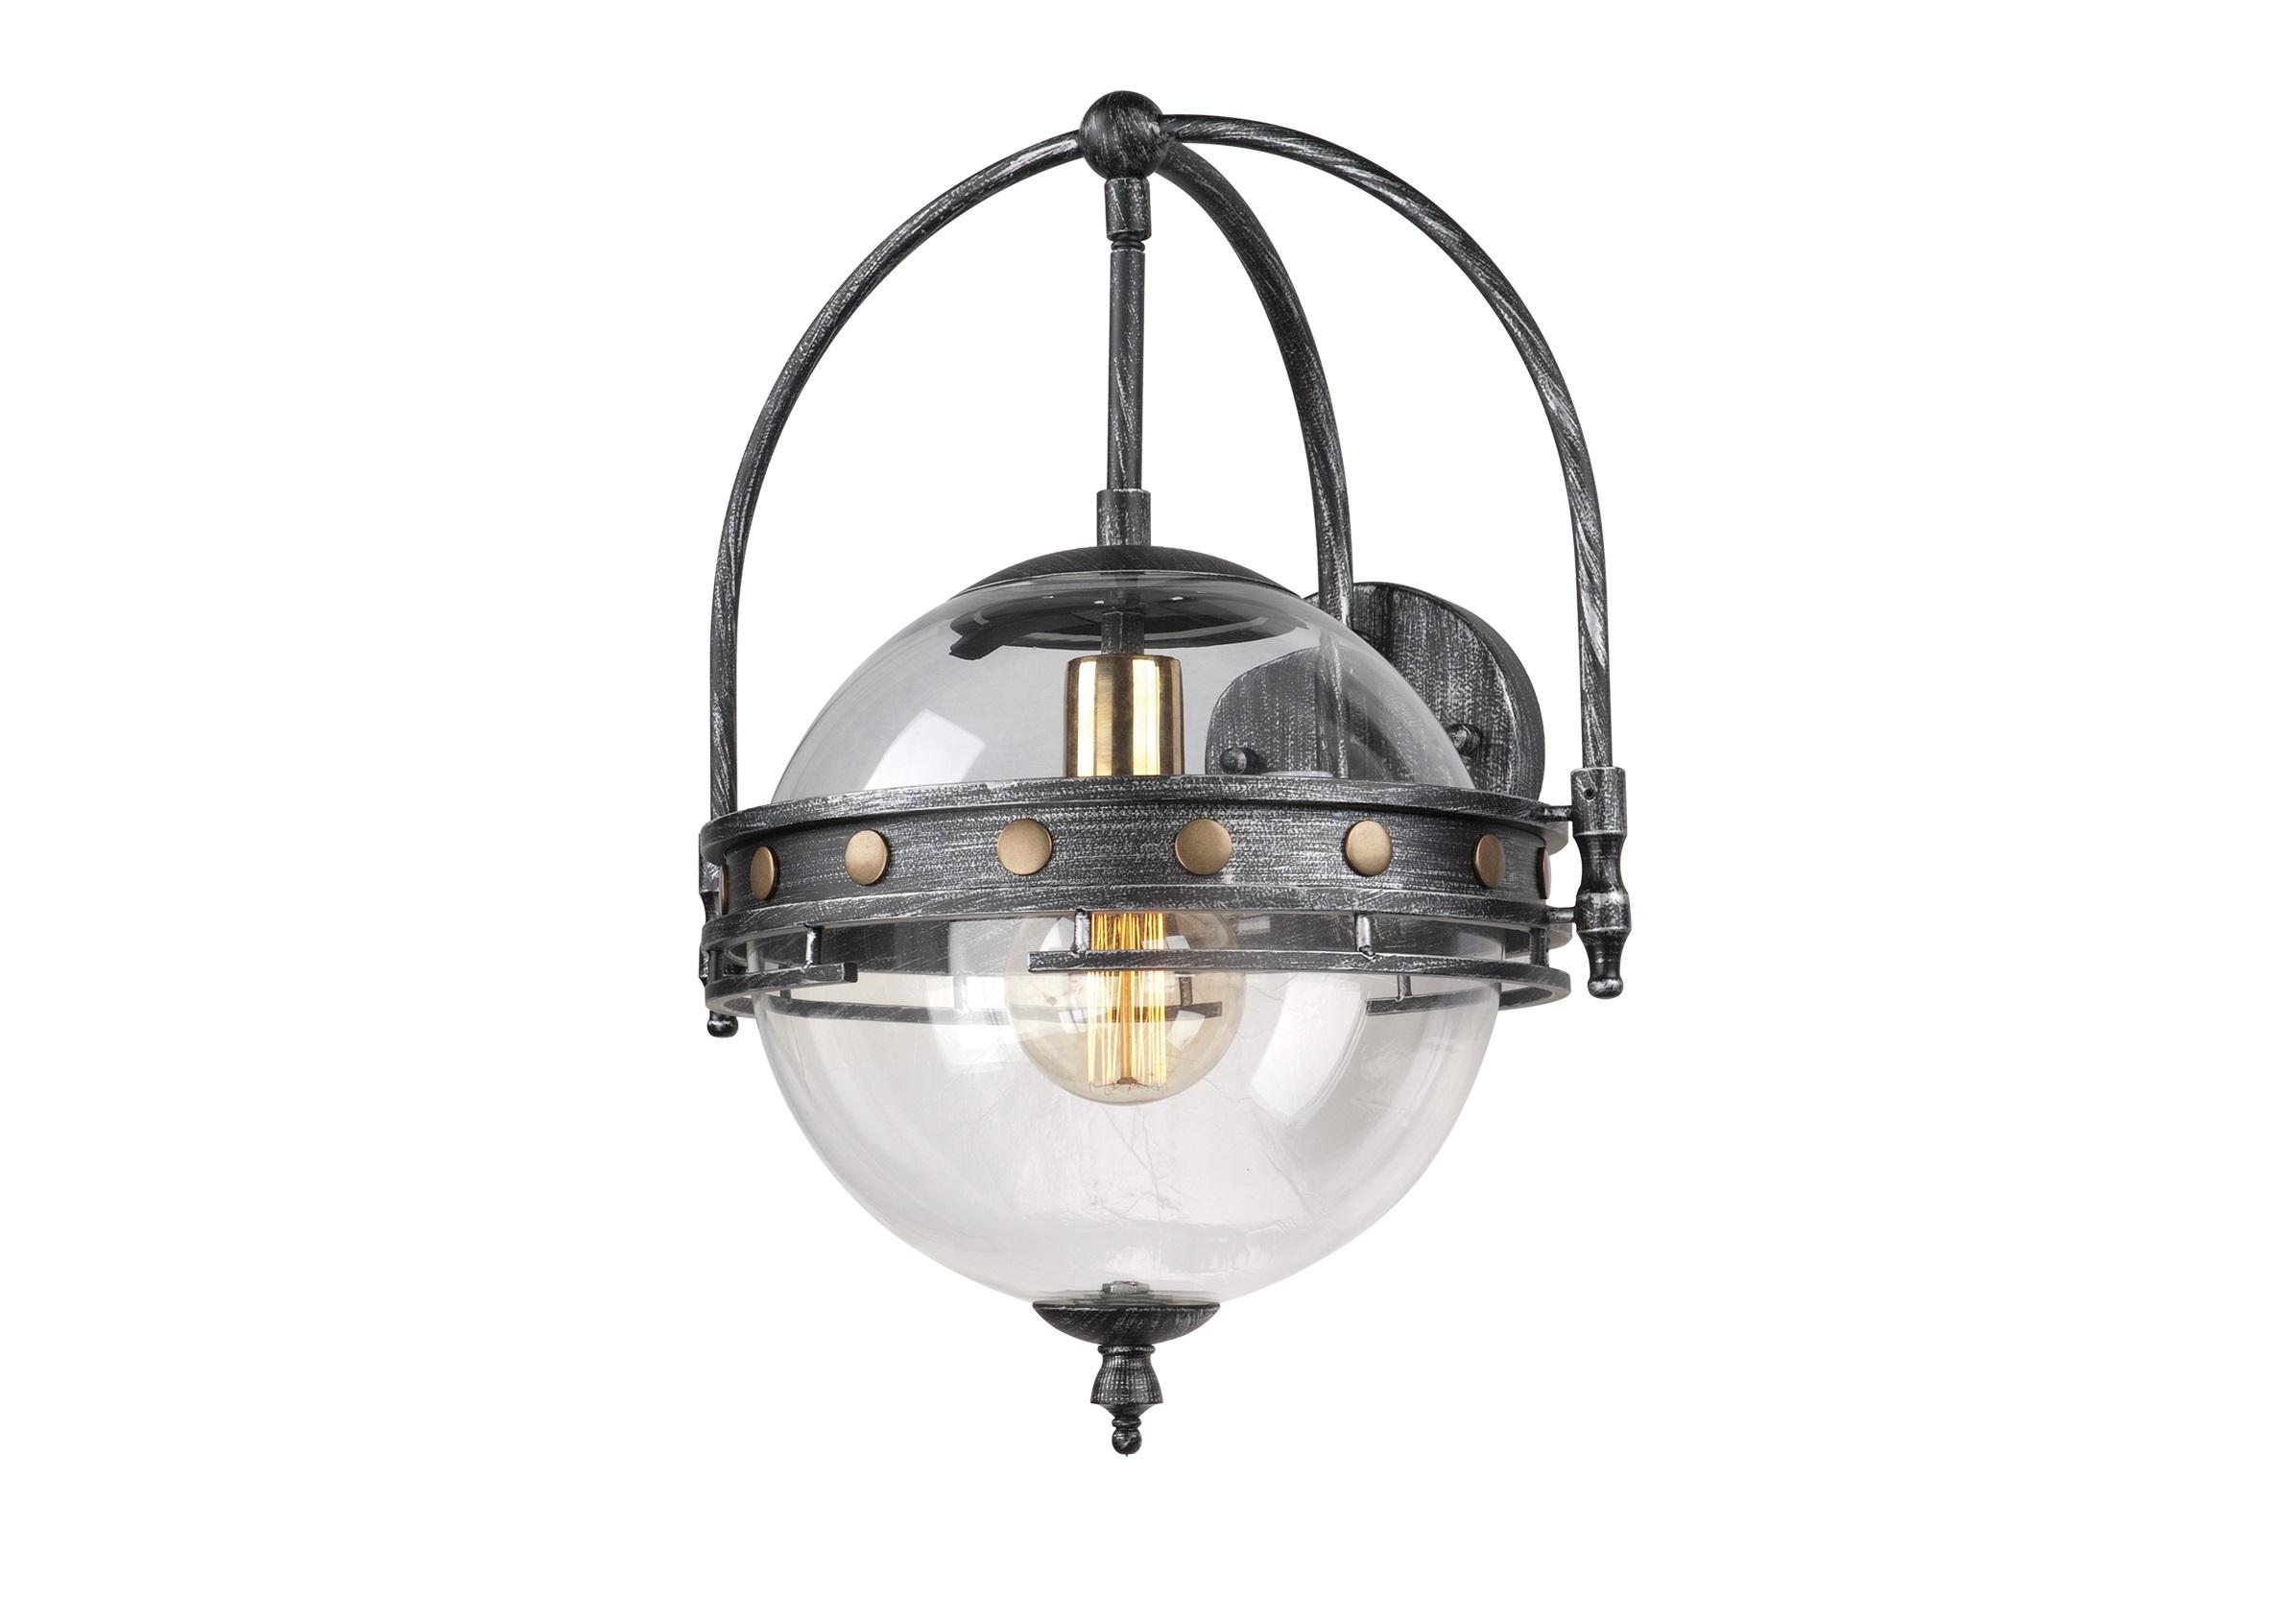 Настенный светильник LSP-9181Уличные настенные светильники<br>&amp;lt;div&amp;gt;&amp;lt;div&amp;gt;Вид цоколя: E27&amp;lt;/div&amp;gt;&amp;lt;div&amp;gt;Мощность: 60W&amp;lt;/div&amp;gt;&amp;lt;div&amp;gt;Количество ламп: 1&amp;lt;/div&amp;gt;&amp;lt;div&amp;gt;Наличие ламп да.&amp;lt;/div&amp;gt;&amp;lt;/div&amp;gt;<br><br>Material: Металл<br>Length см: None<br>Width см: 33<br>Depth см: 37<br>Height см: 45